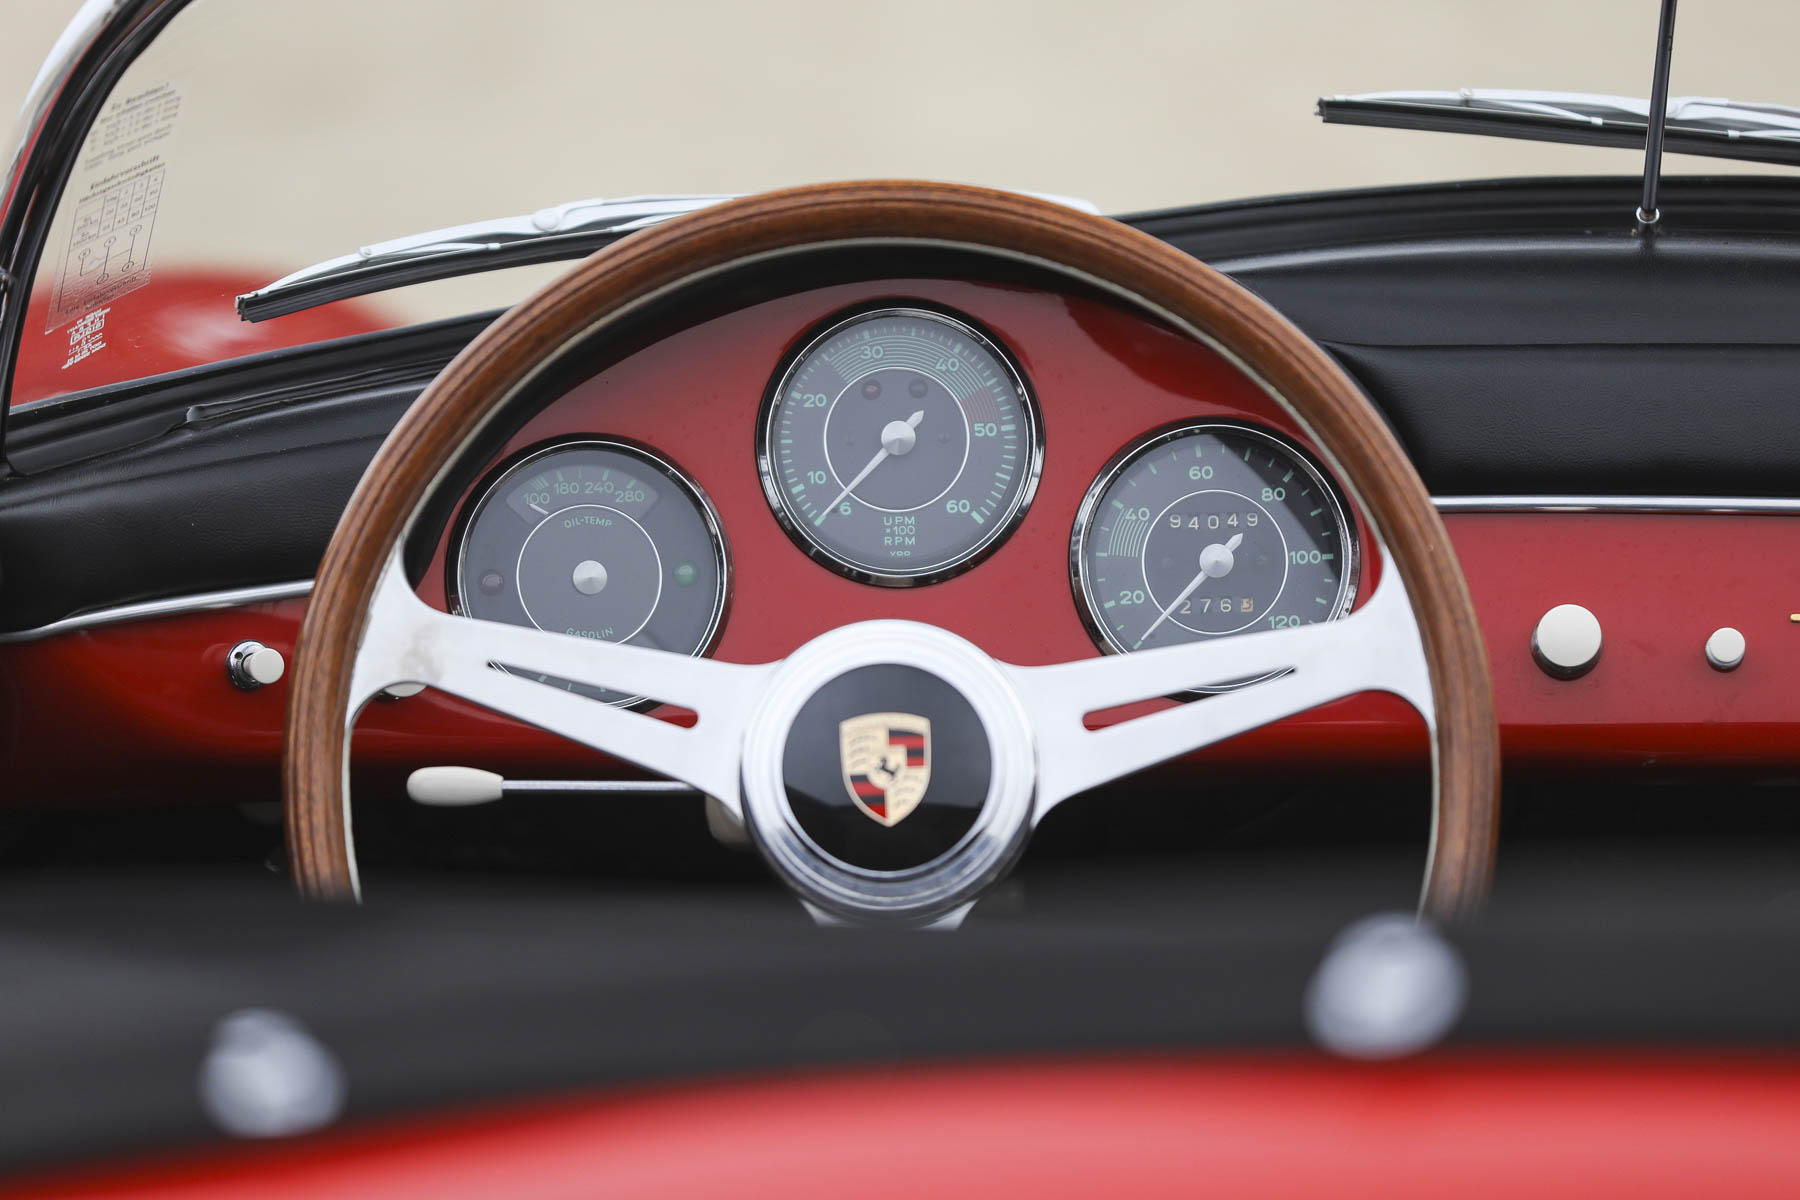 1957 Porsche 356 A Speedster steering wheel and gauge detail